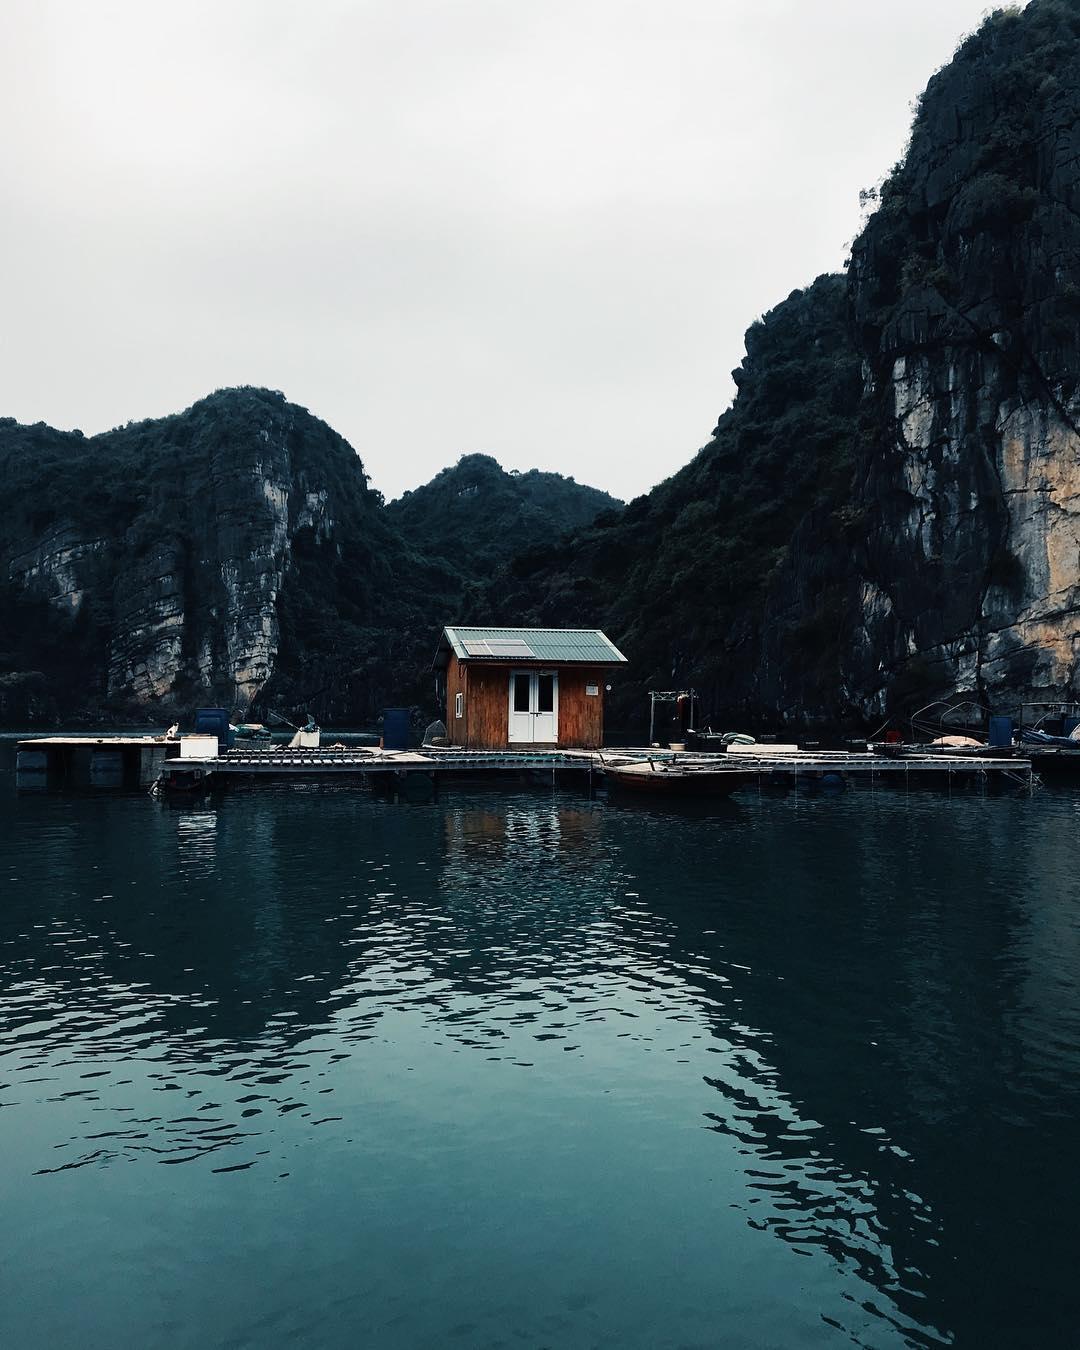 Vung Vieng Fishing Village - Photo by tiagorpalma via Instagram